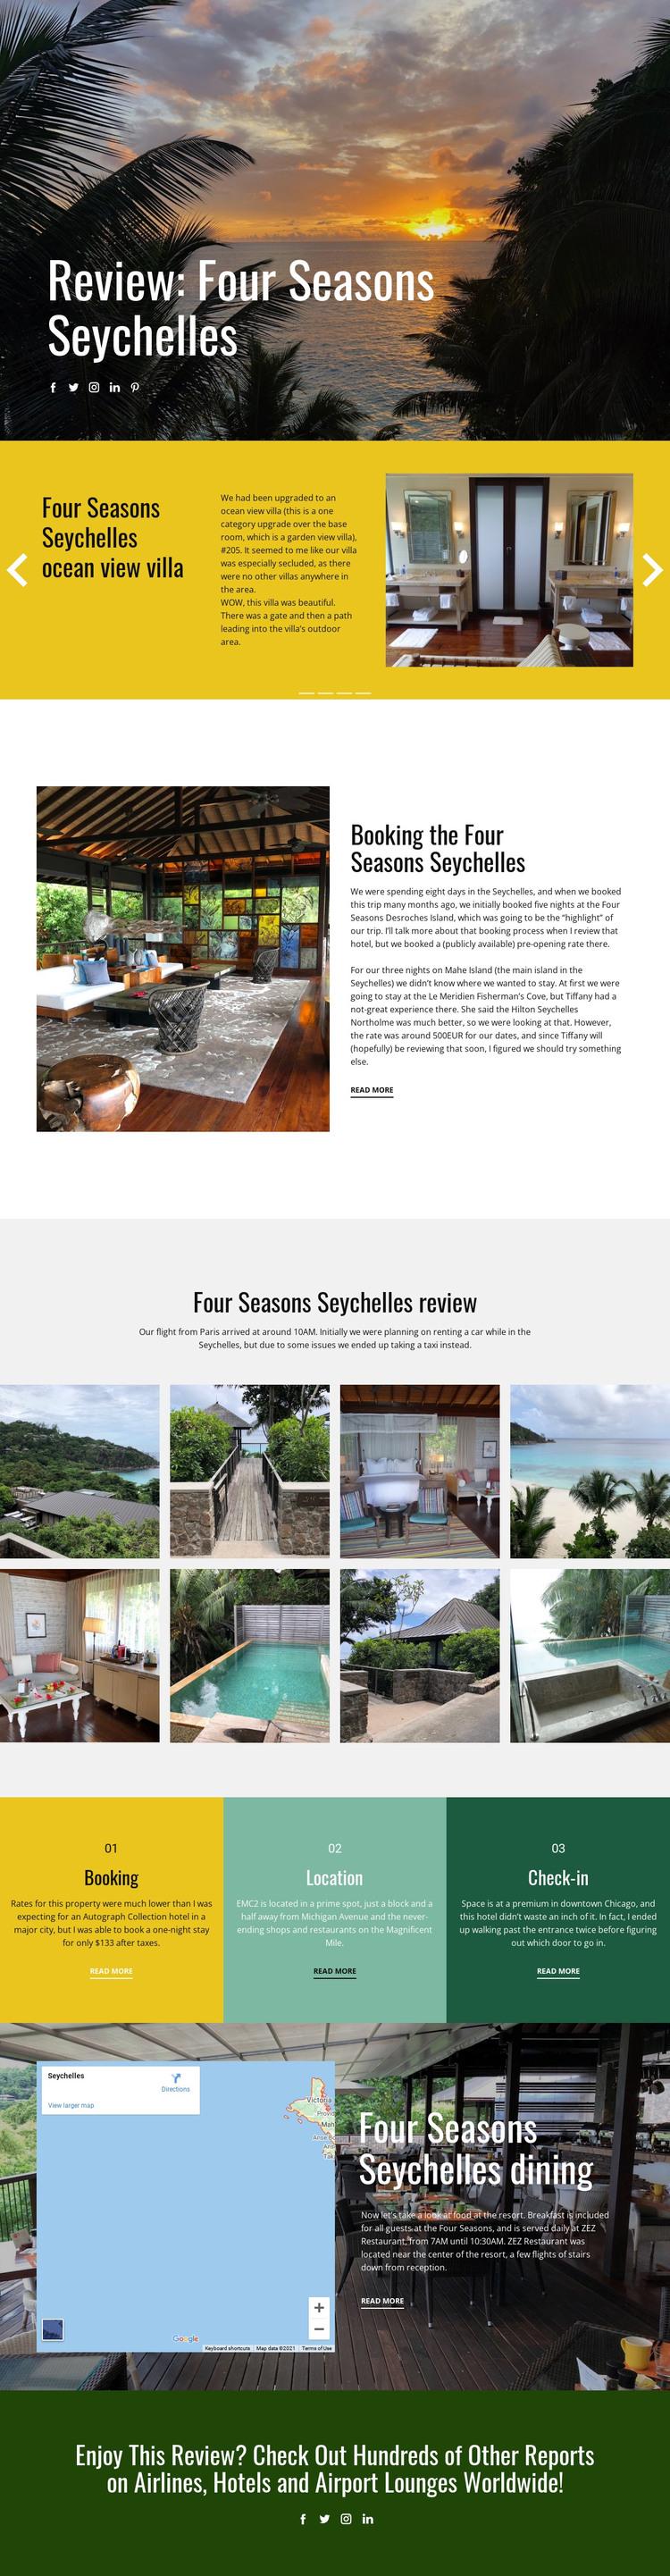 Four Seasons Web Design